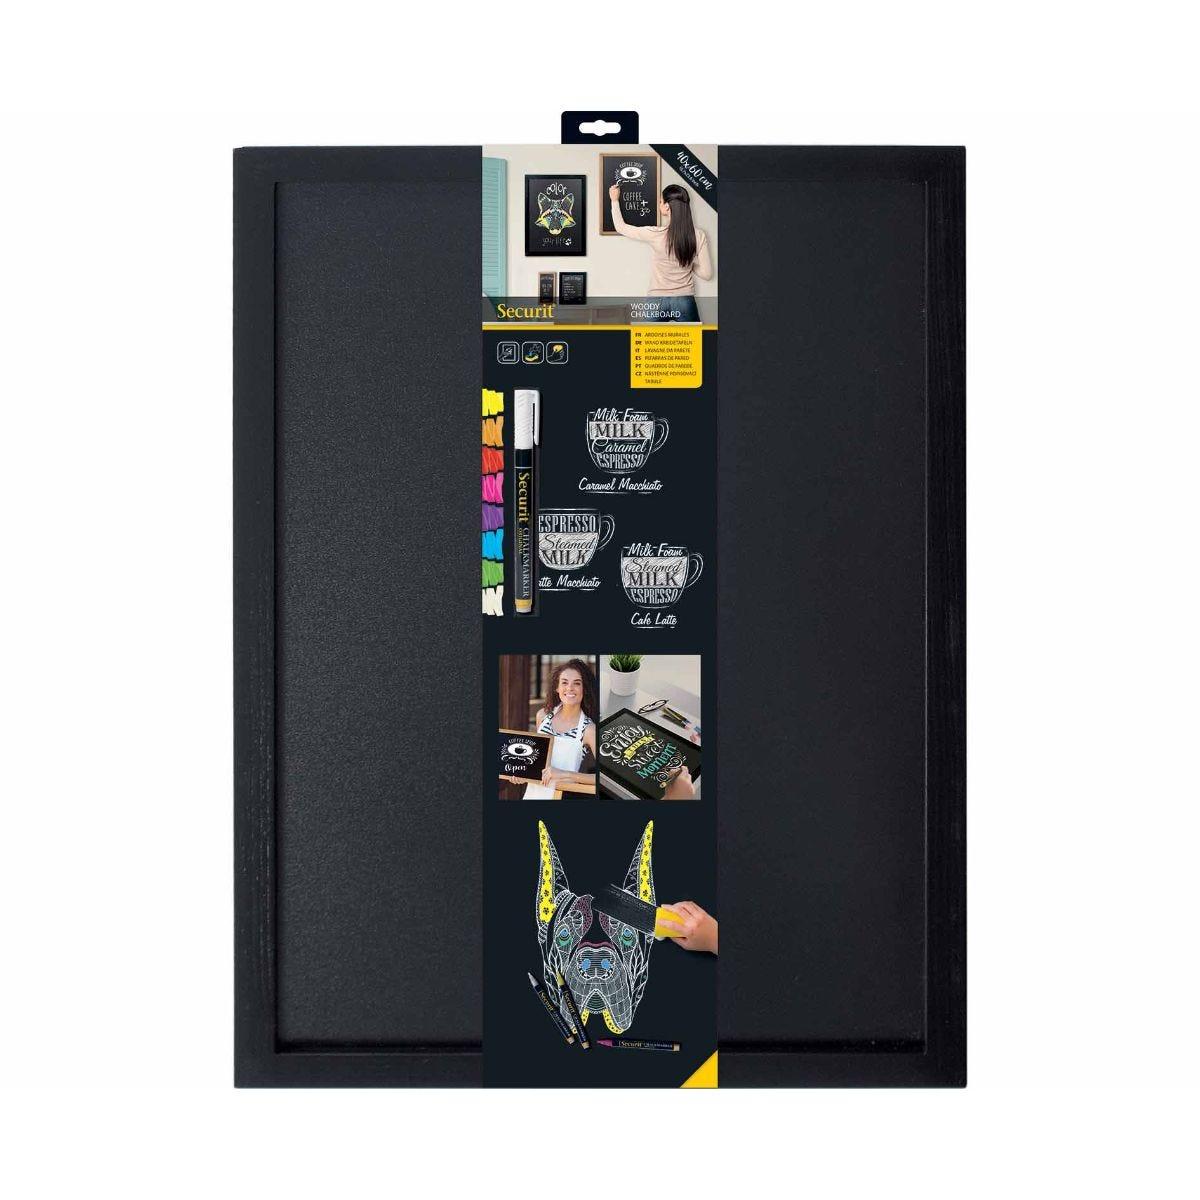 securit wall board woody chalkboard 40 x 60cm, black